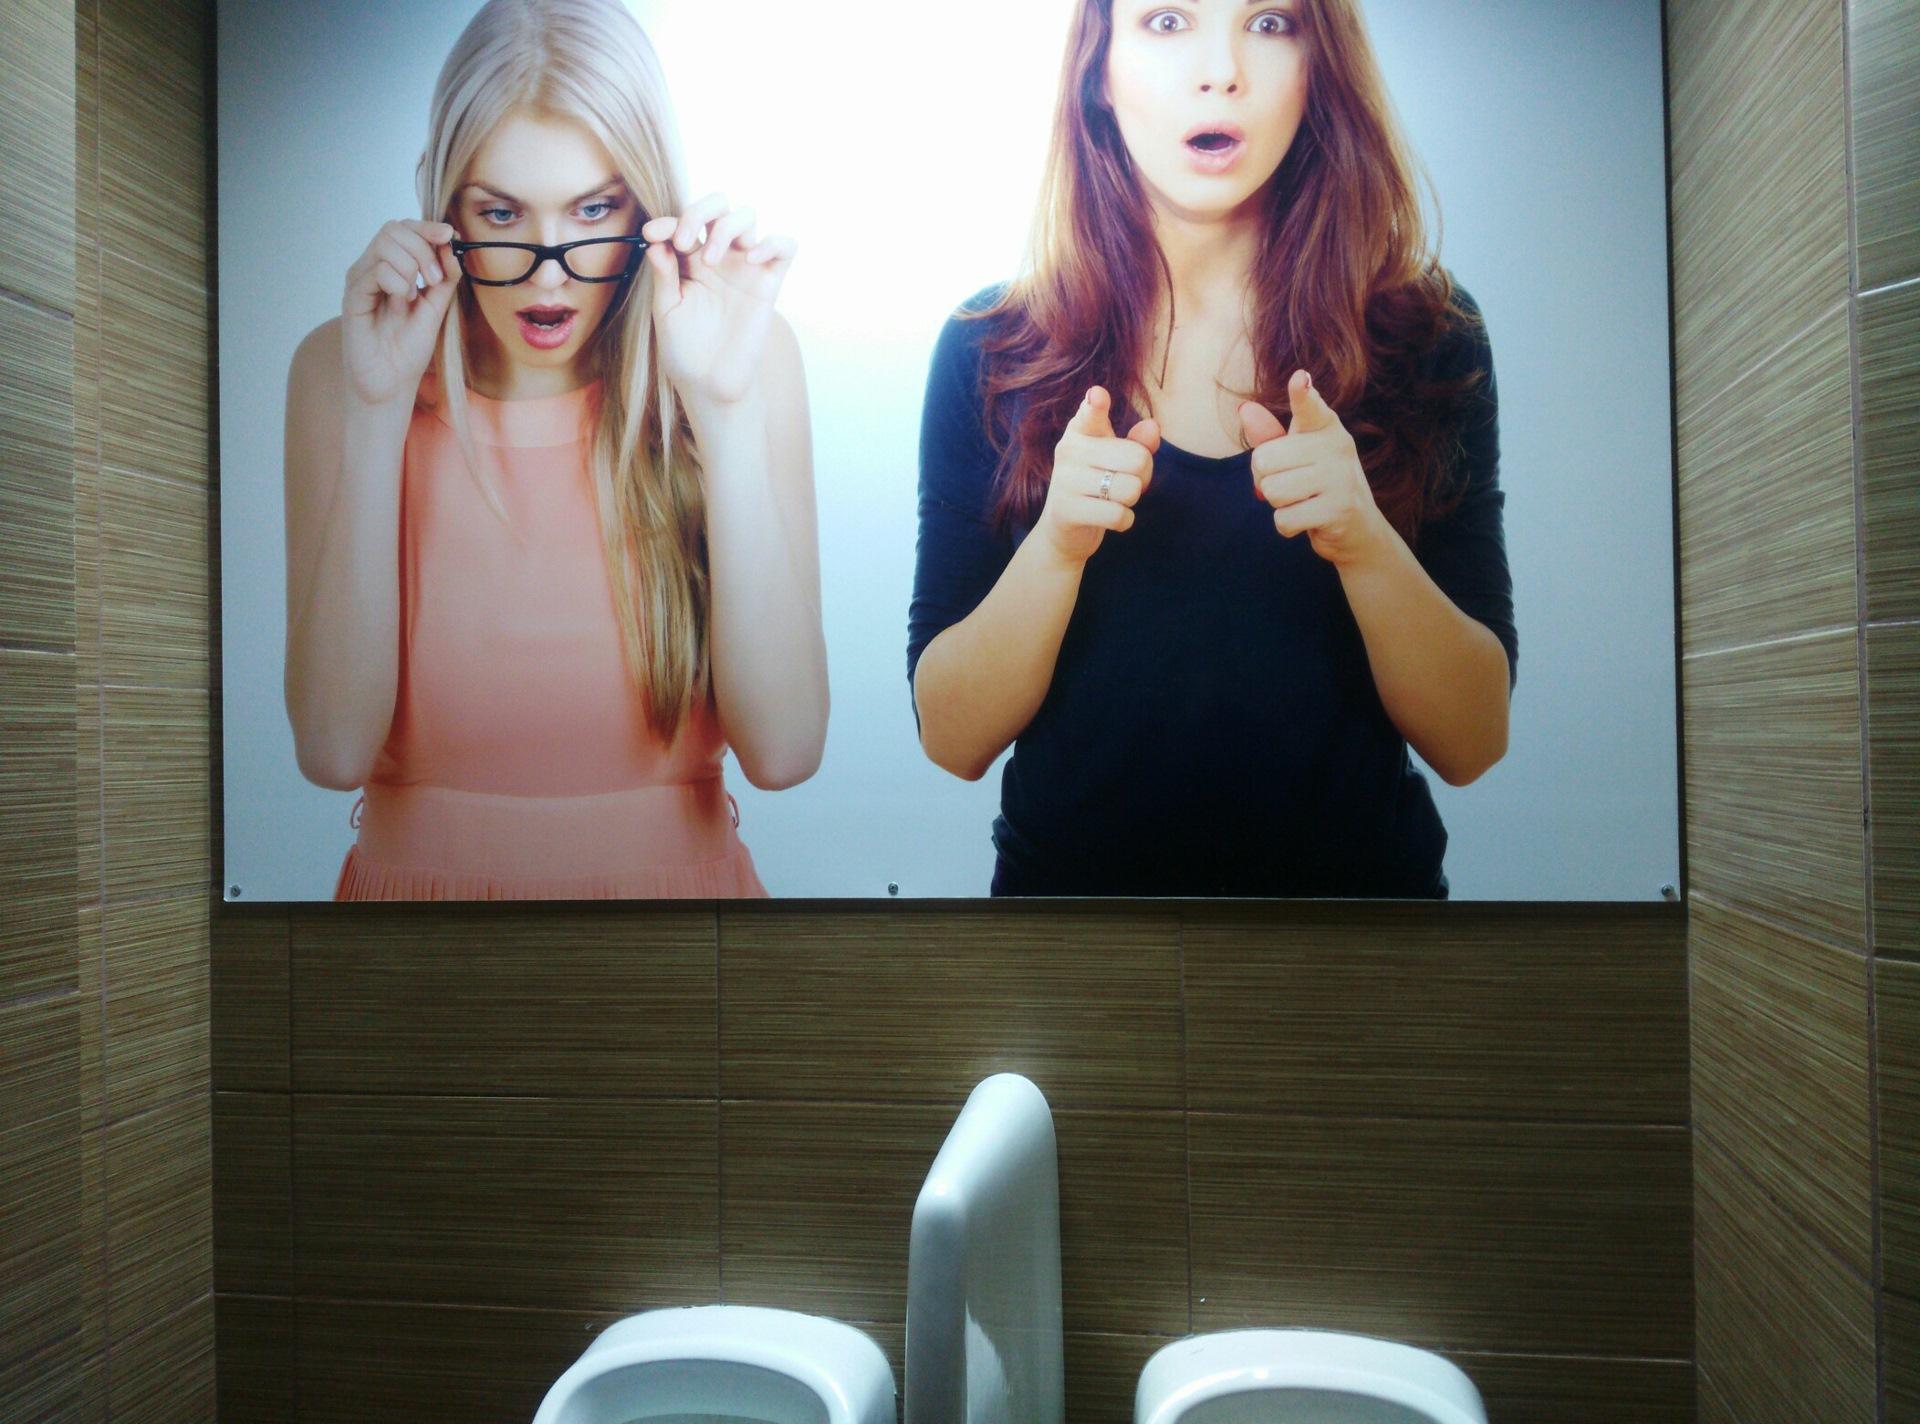 Зашел в туалет а там девушка